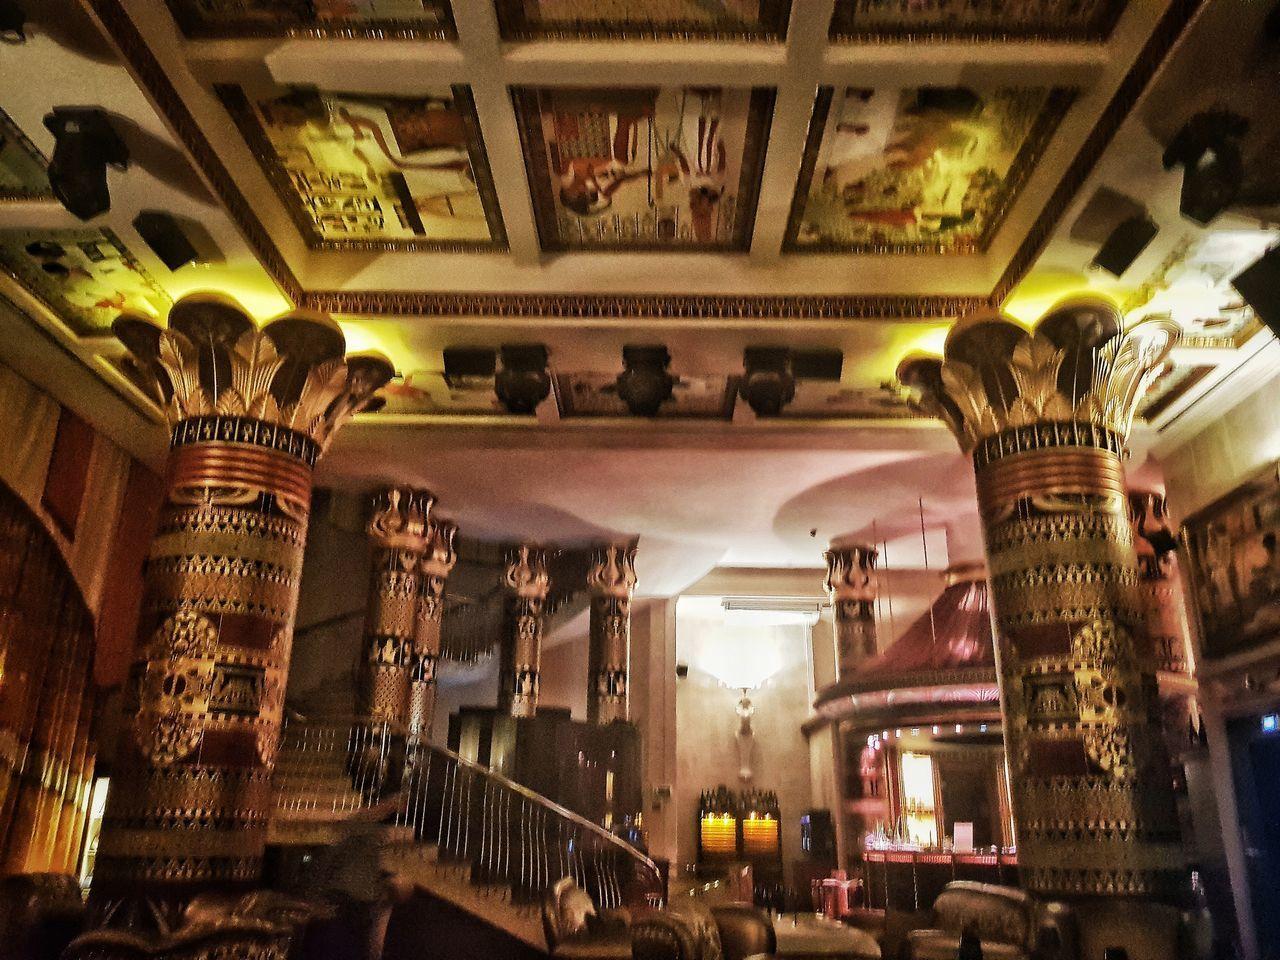 Krasnodar Aton Hotelaton Restoran Restoranaton Egypt